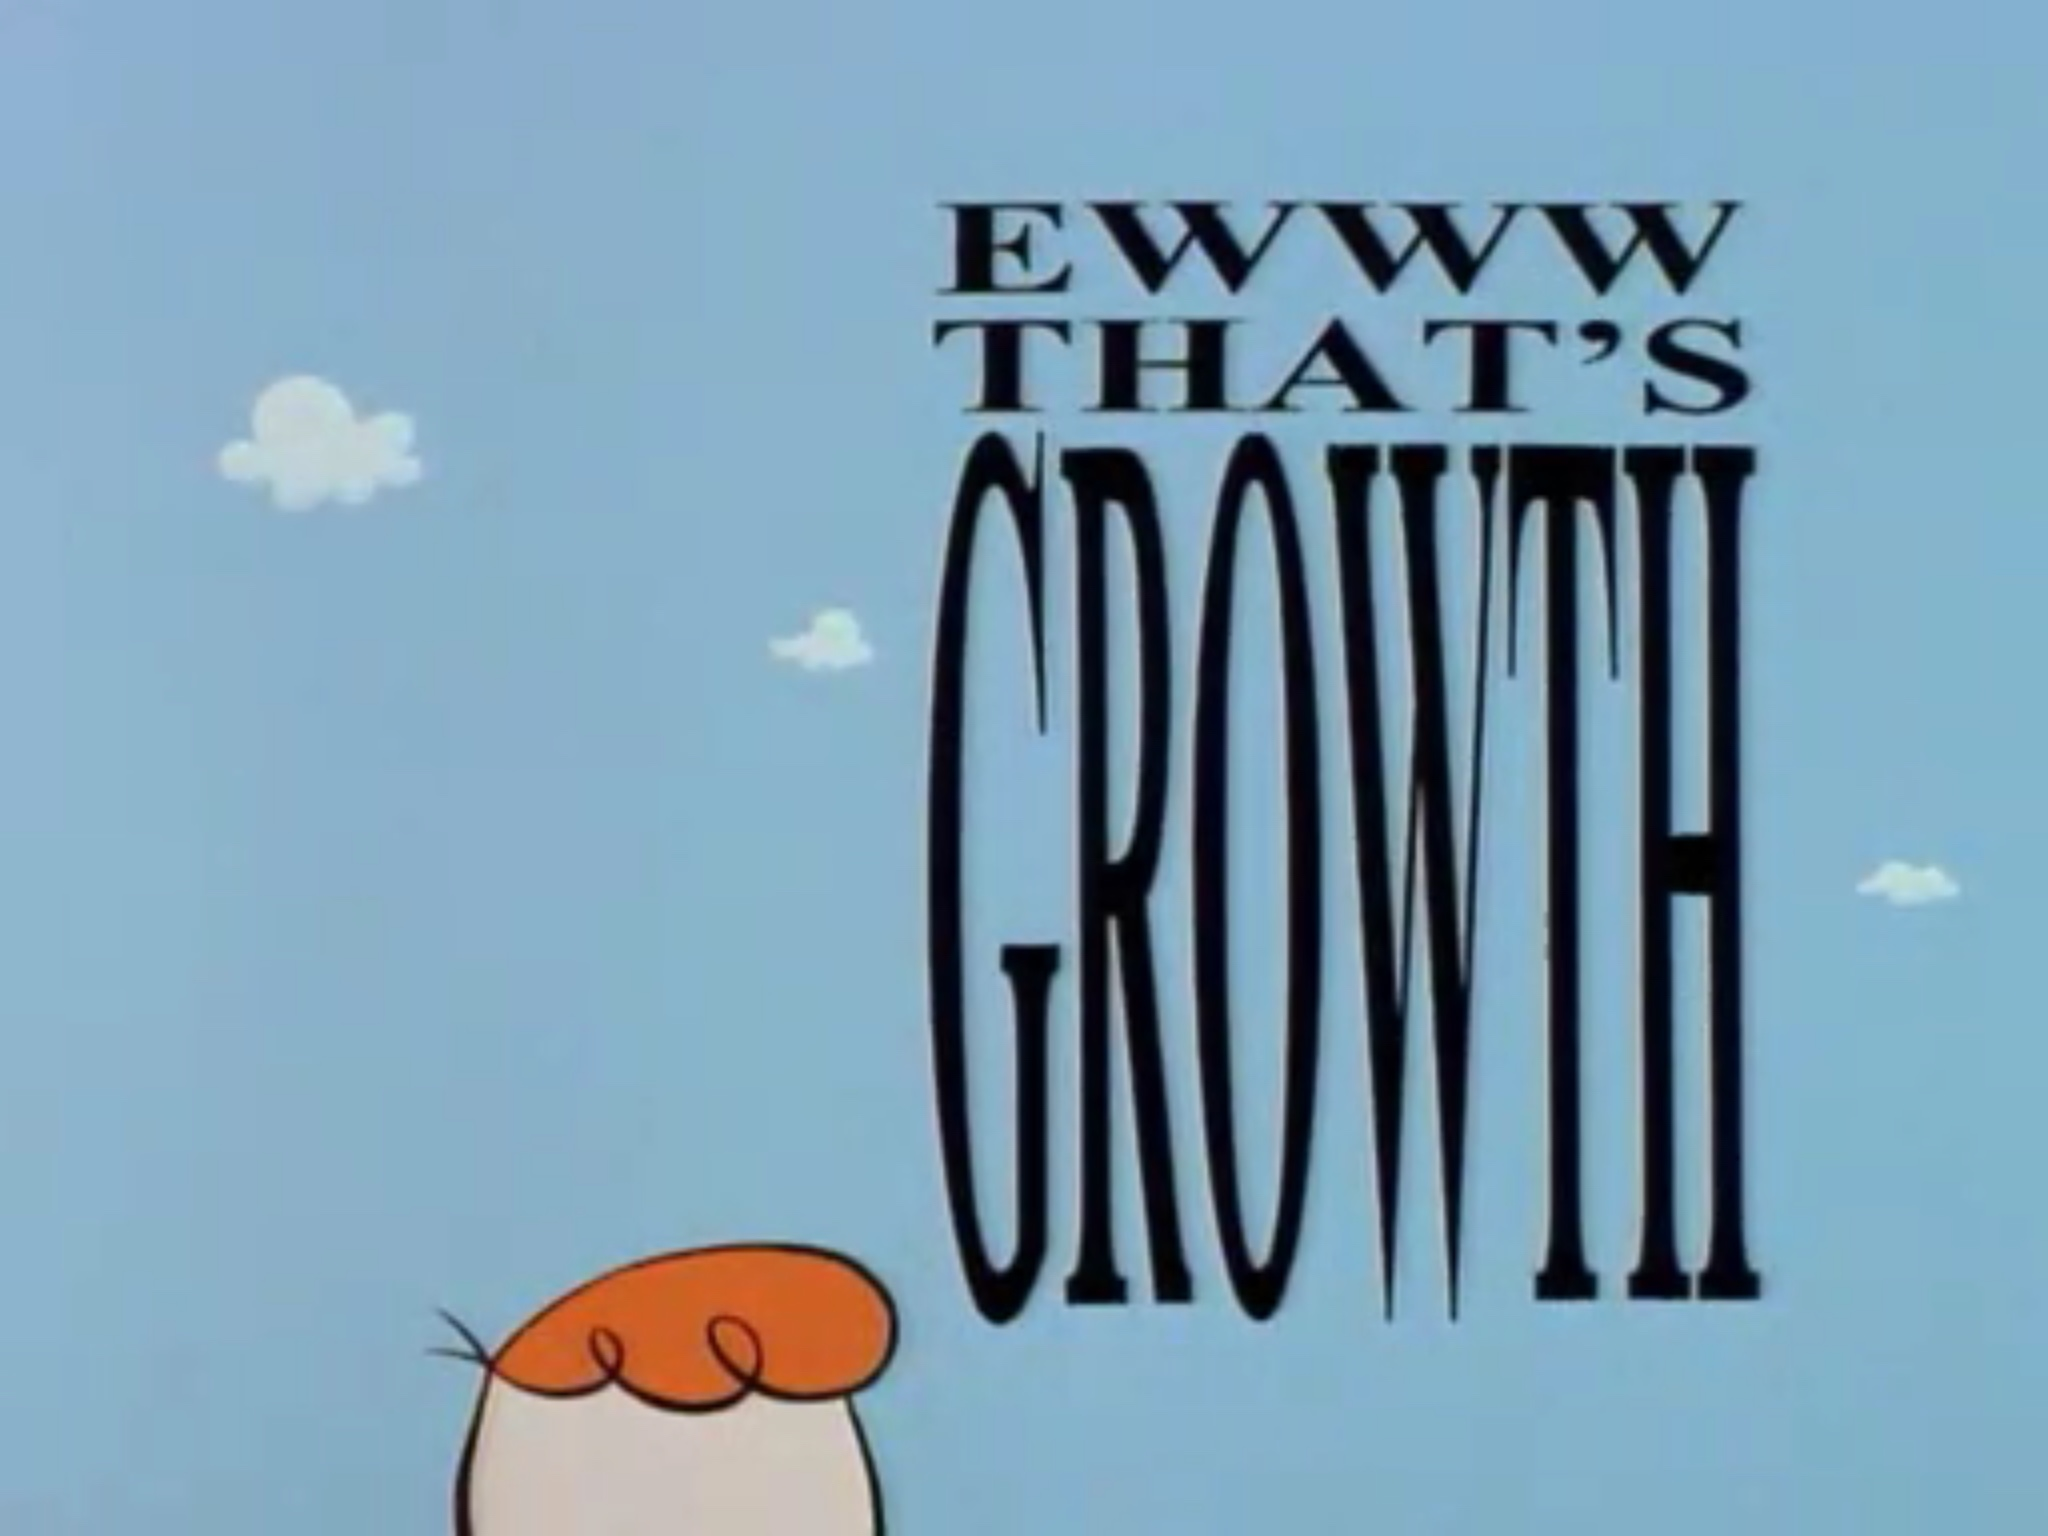 Ewwthatsgrowth